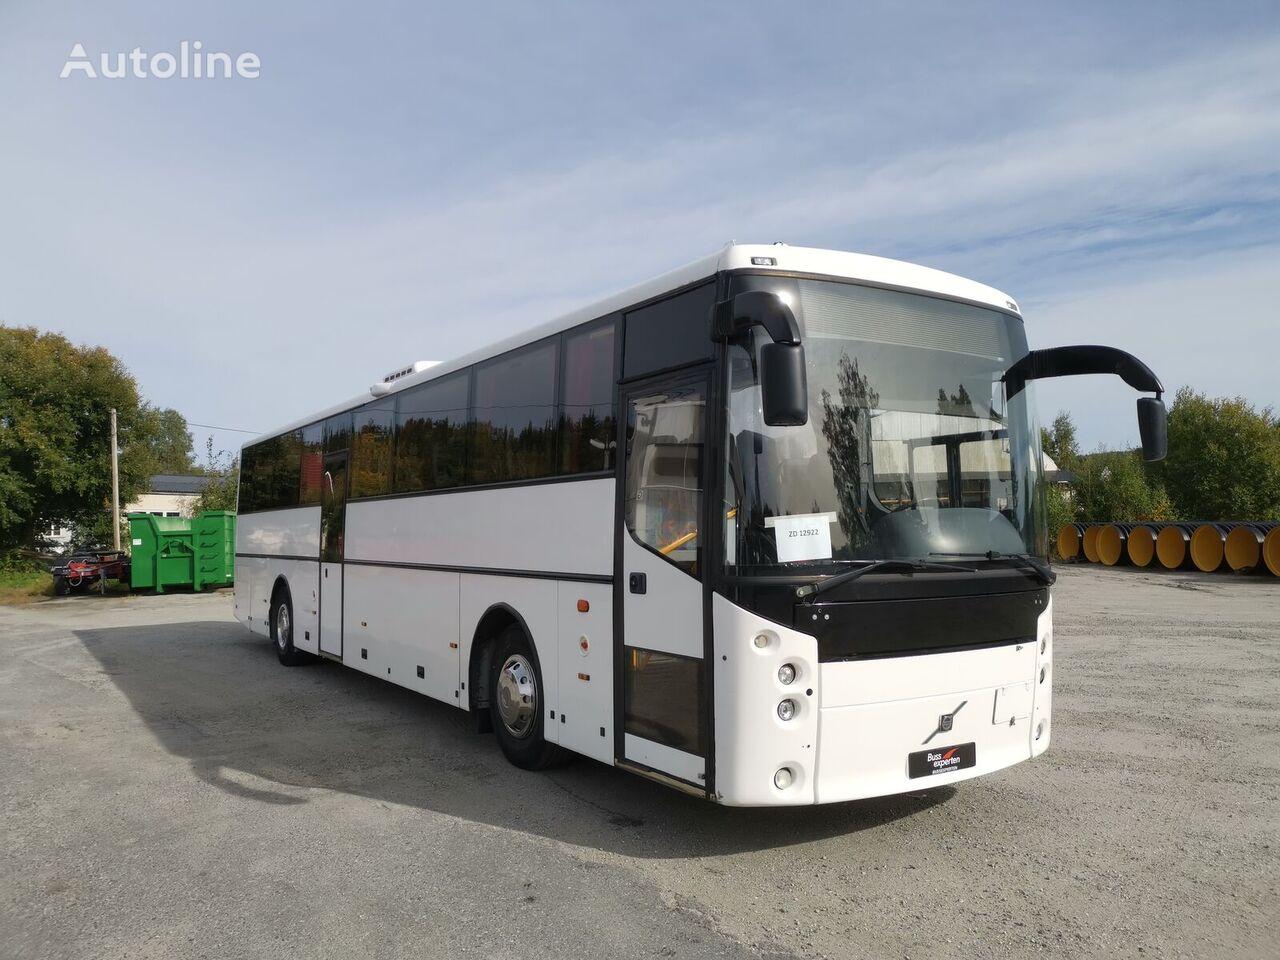 VOLVO B12B. Vest Horisont interurban bus